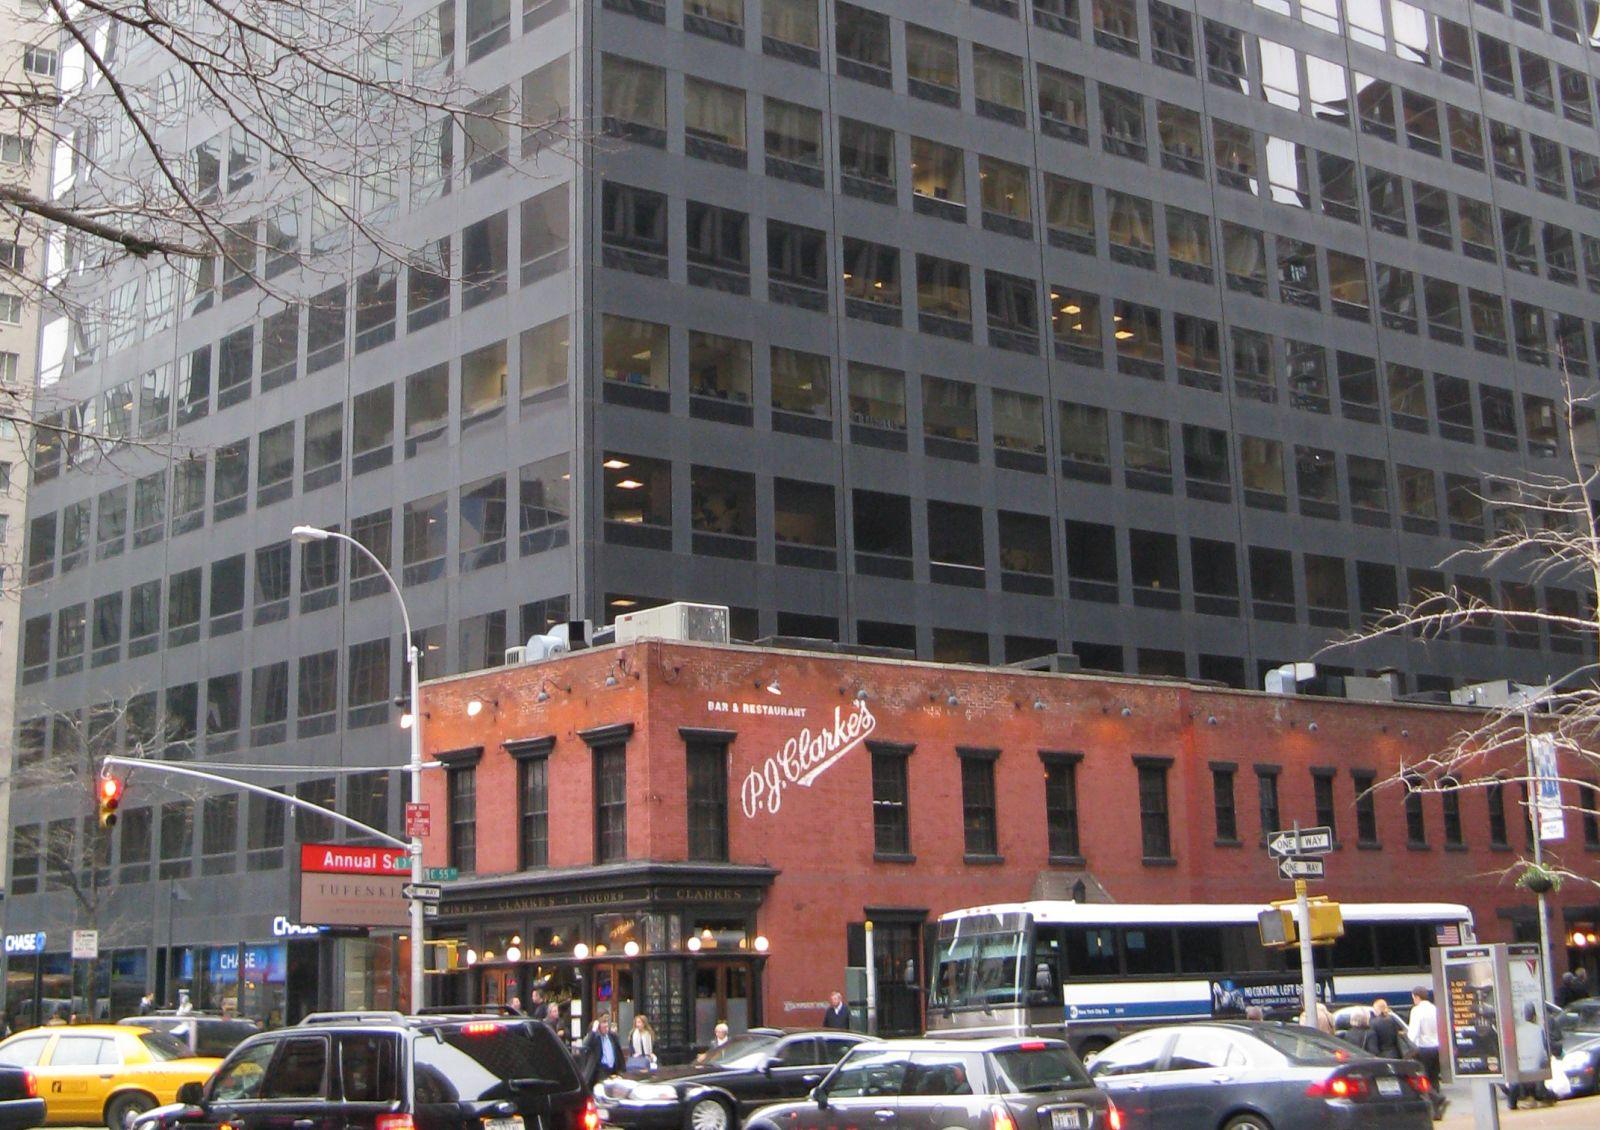 Slovak Restaurant New York City